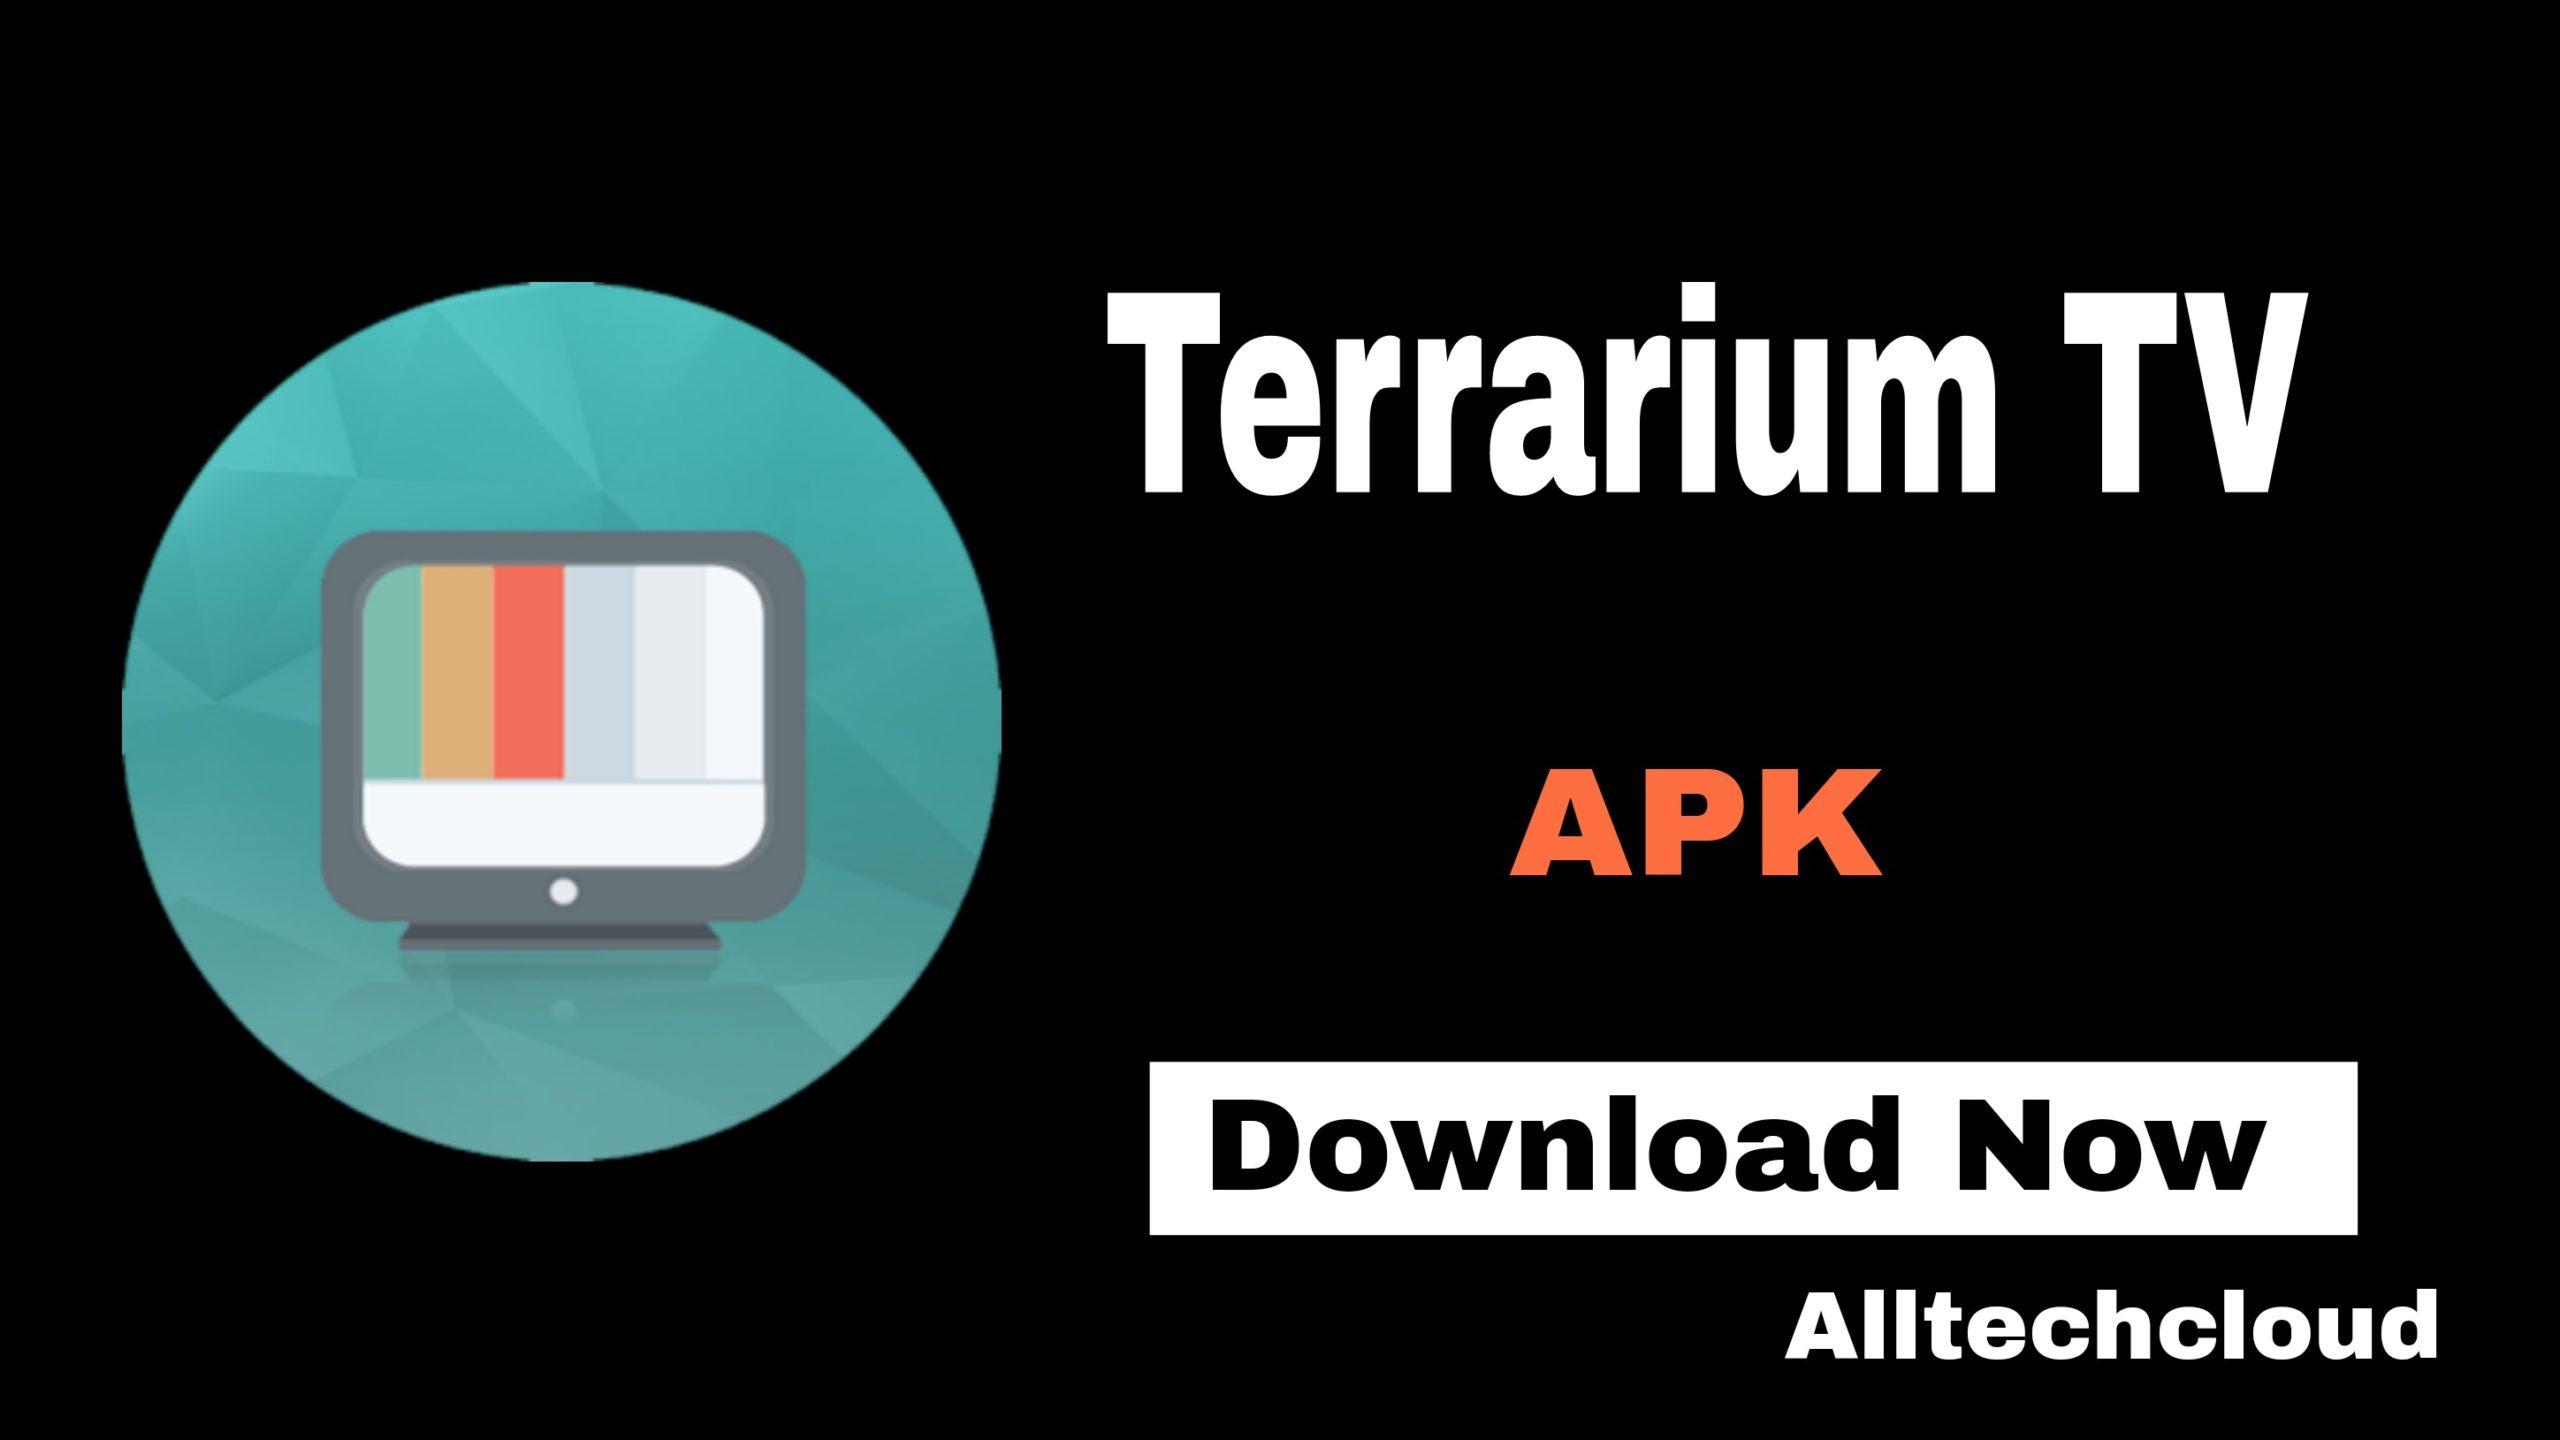 Terrarium TV APK 1.9.10 Free for Android [100% Working] 2021